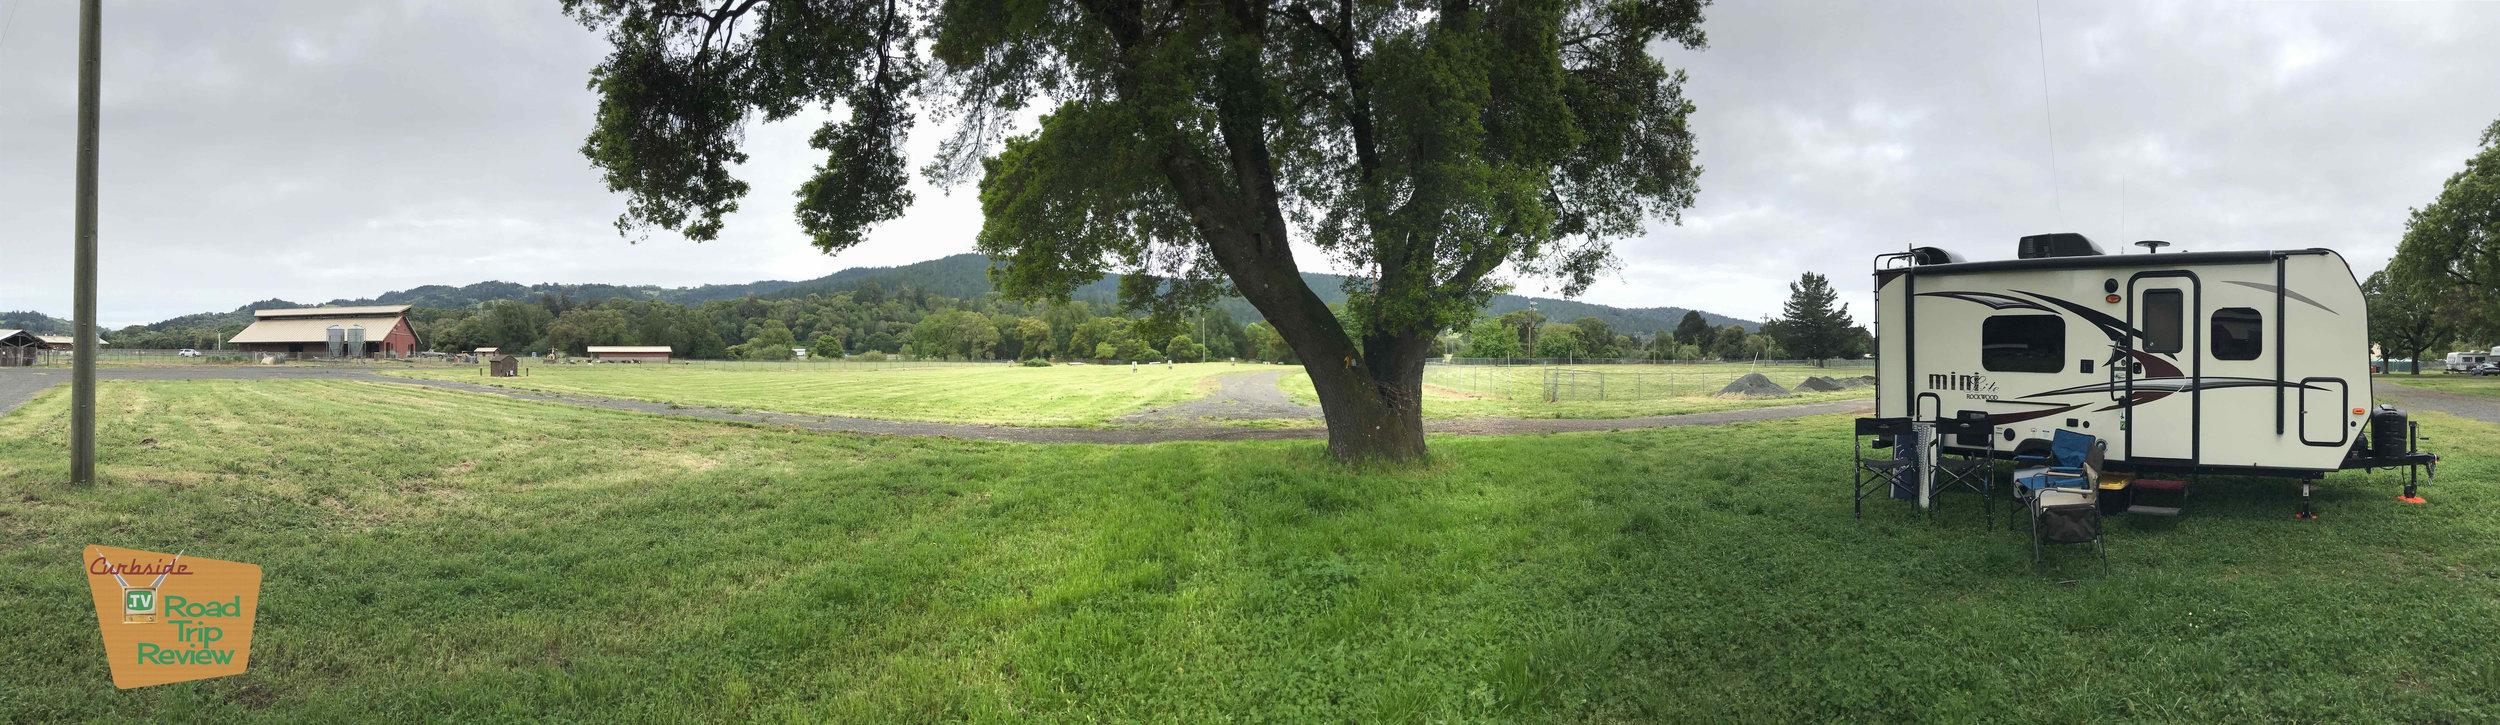 Anderson Valley - 1.jpg